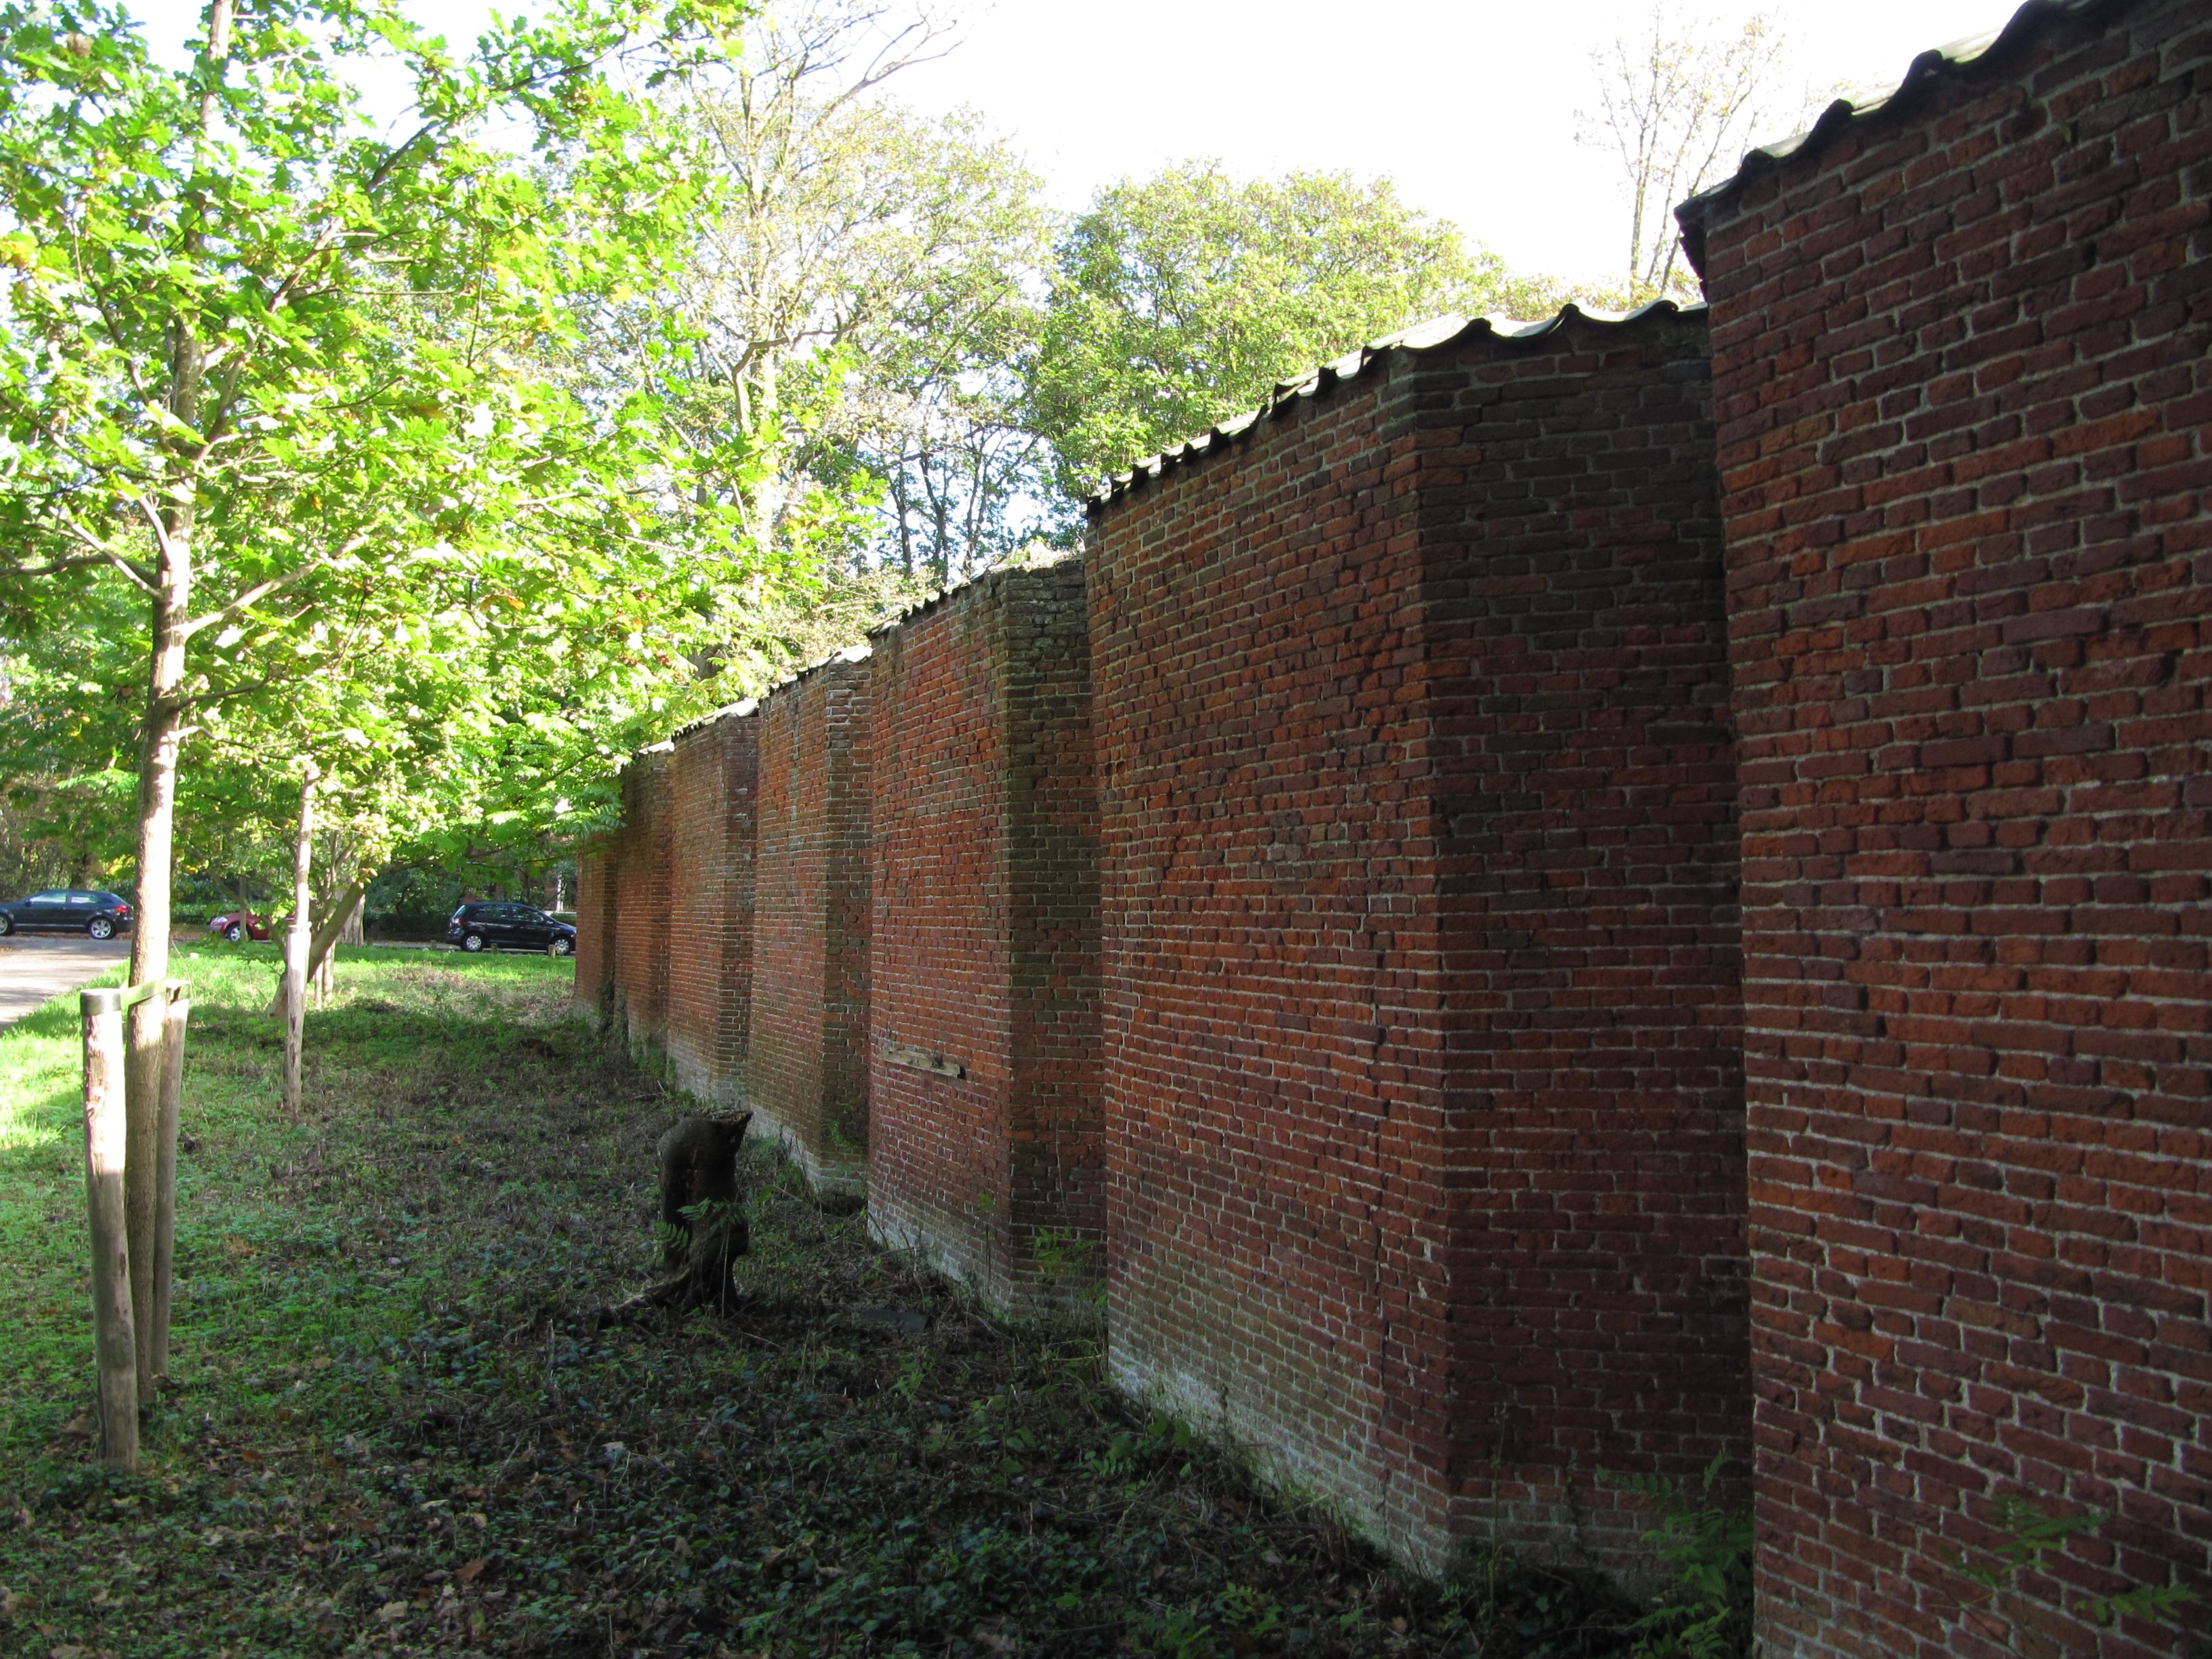 fruitmuur retranchemuur Landgoed Marlot in Den Haag